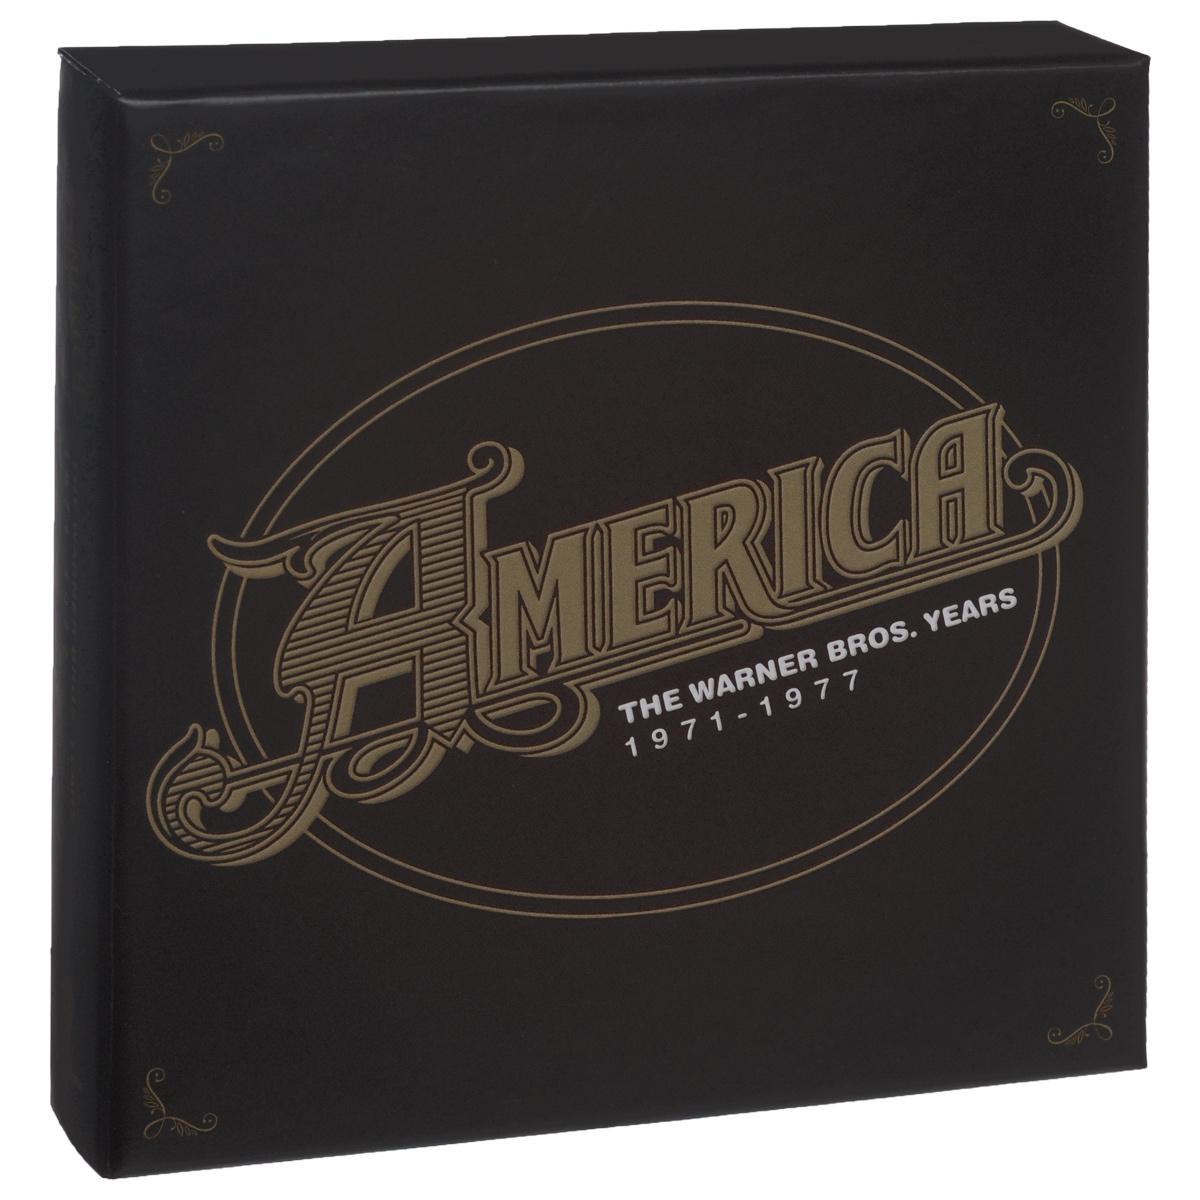 America America. The Warner Bros. Years 1971-1977 (8 CD)